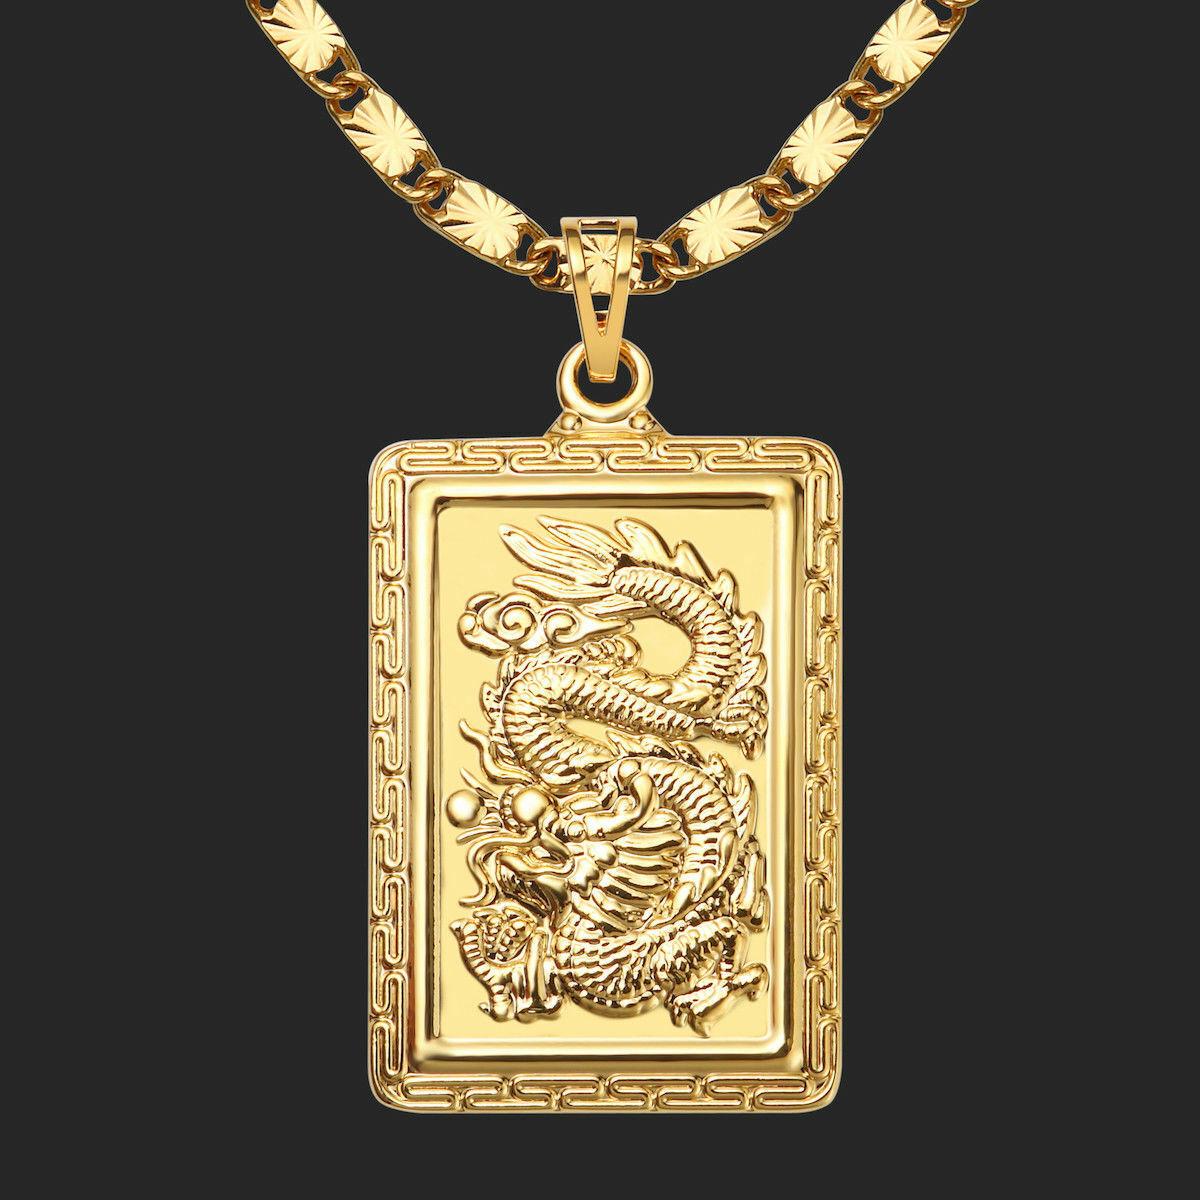 1756f177a4 Herren GoldKette mit Drache Anhänger Halskette 24K 999er Gold Vergoldet 60cm